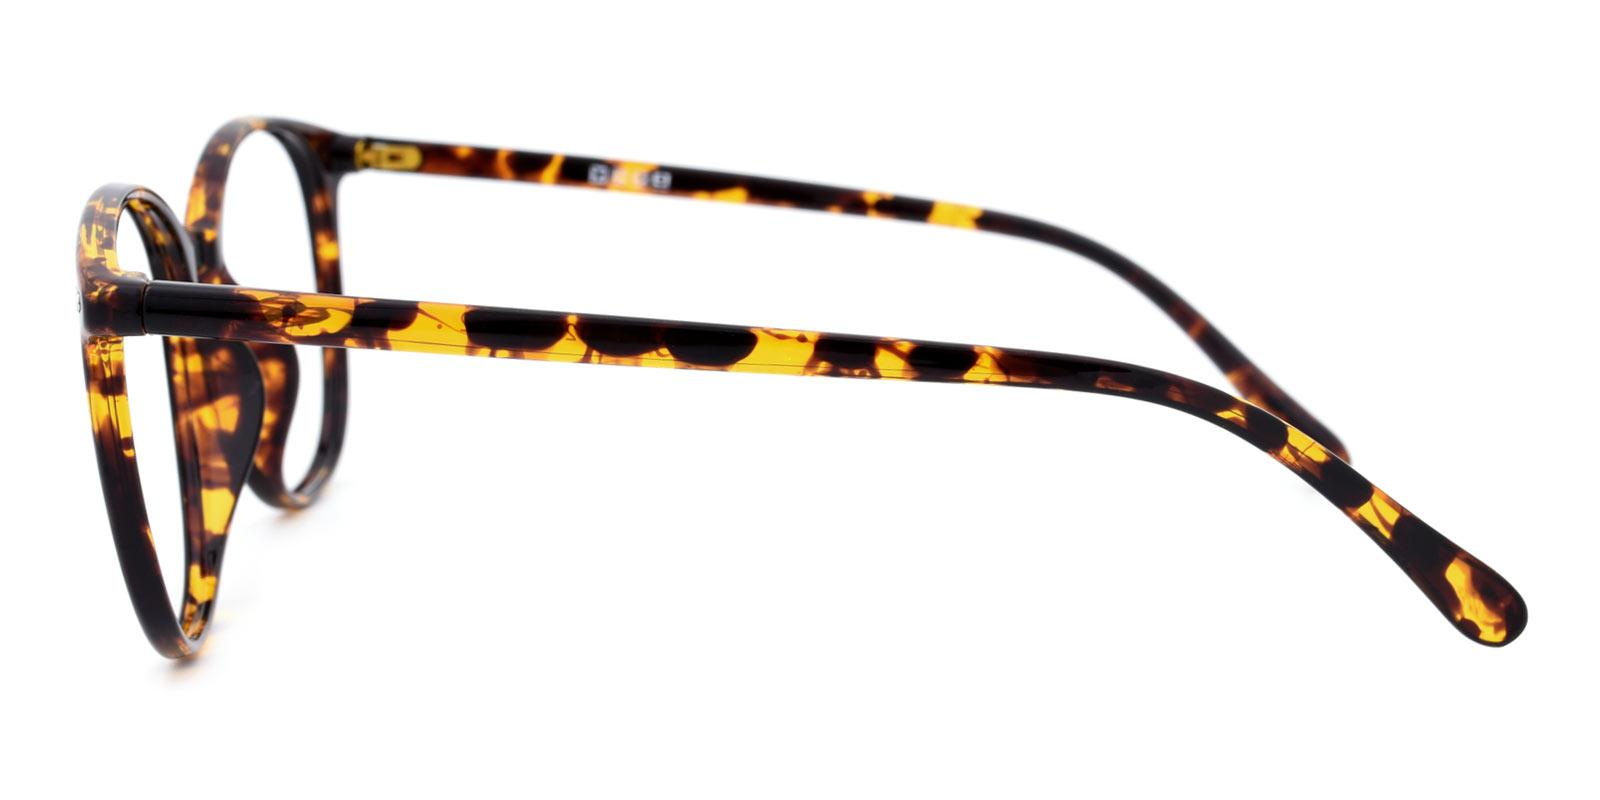 Julian-Tortoise-Round / Square-TR-Eyeglasses-detail